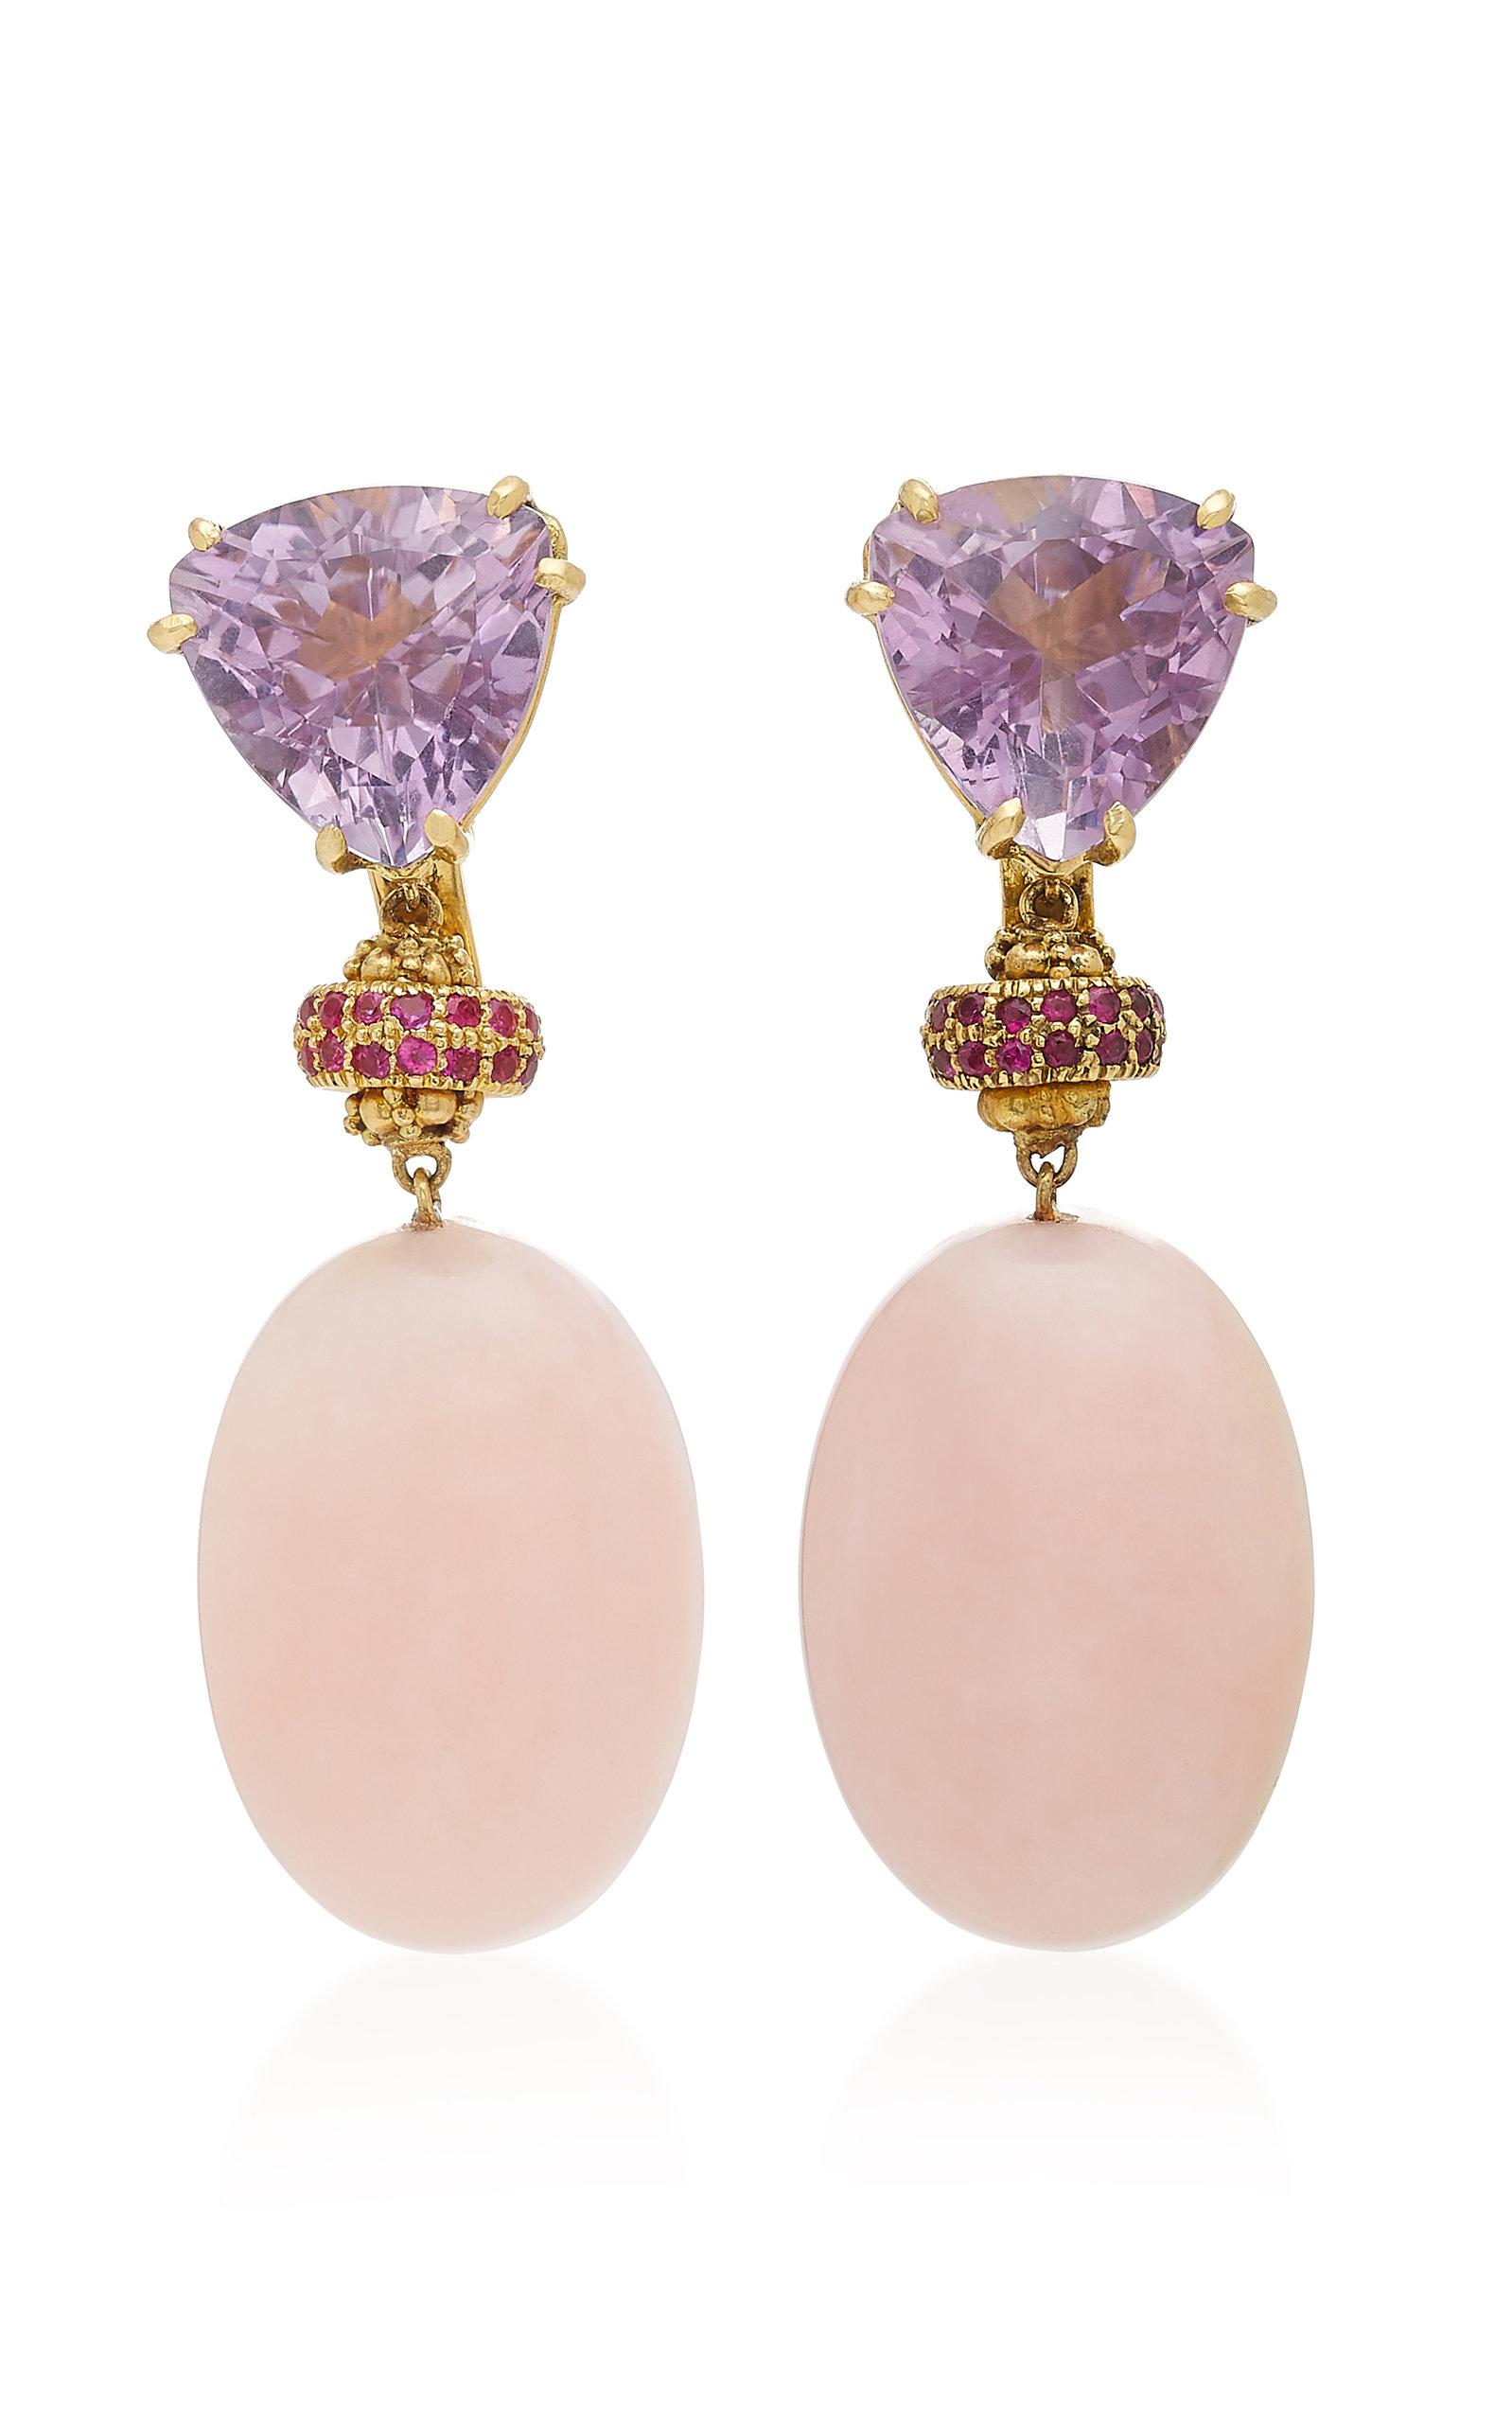 SORAB & ROSHI 18K Gold Multi-Stone Clip Earrings